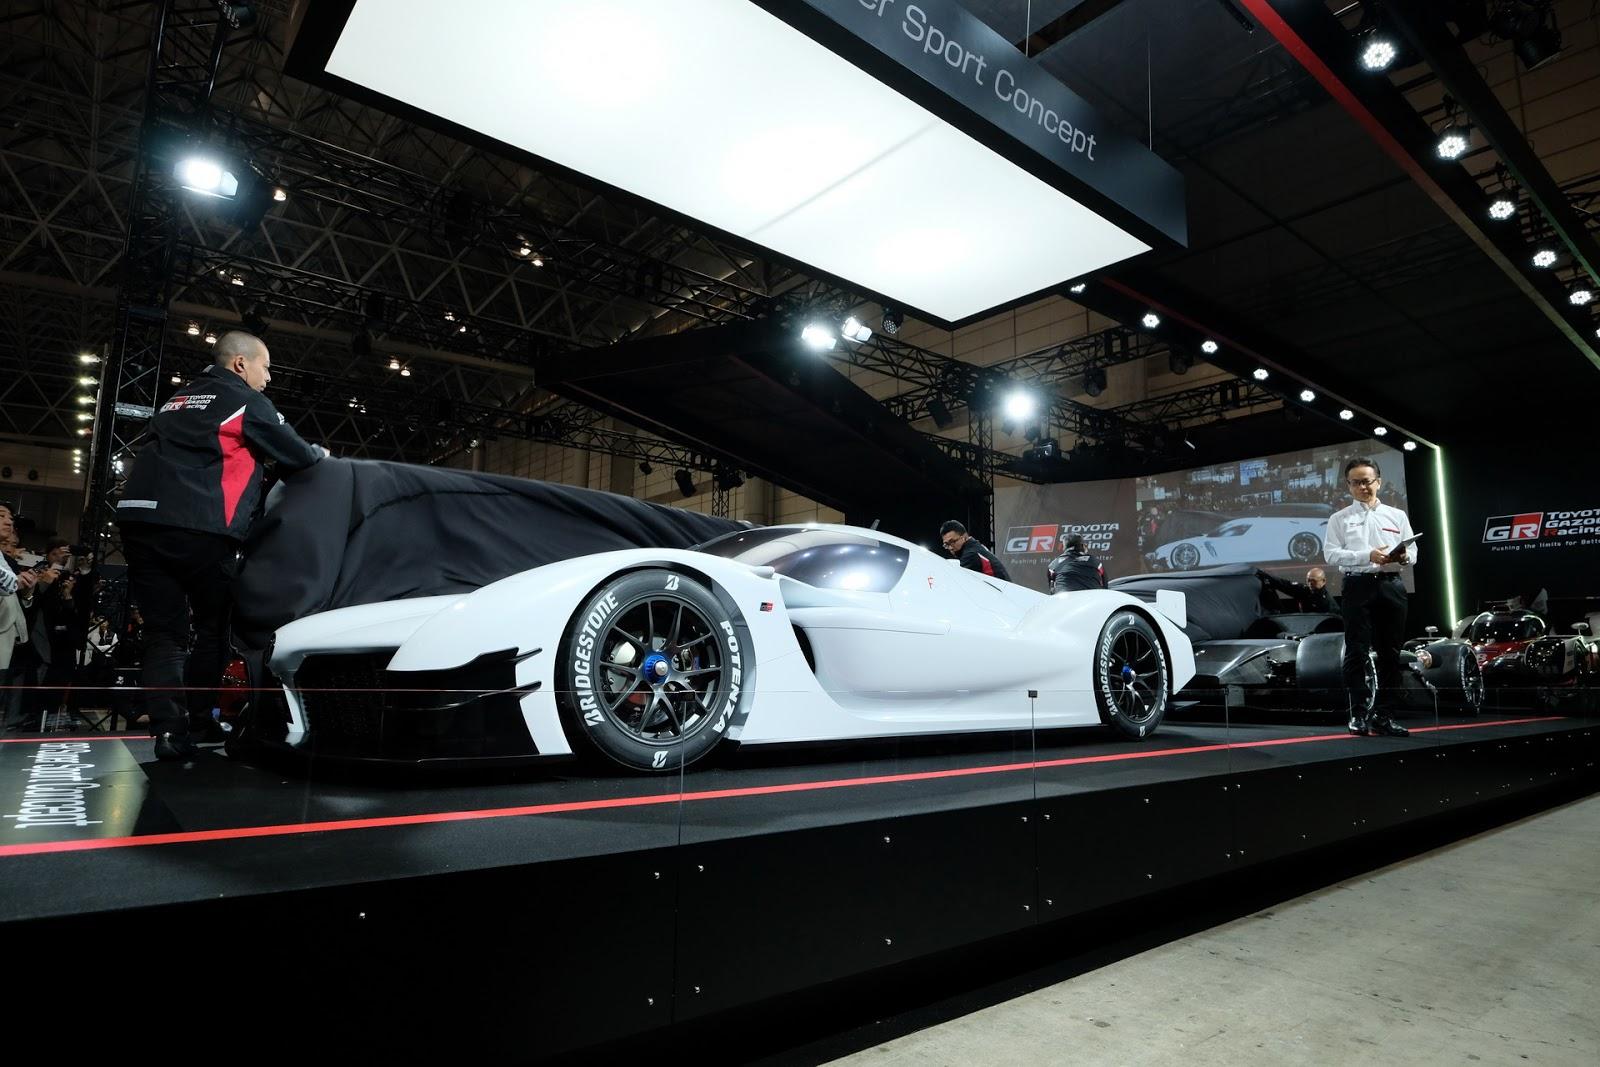 Gazoo-Racing-1Sport-Concept-07.jpg